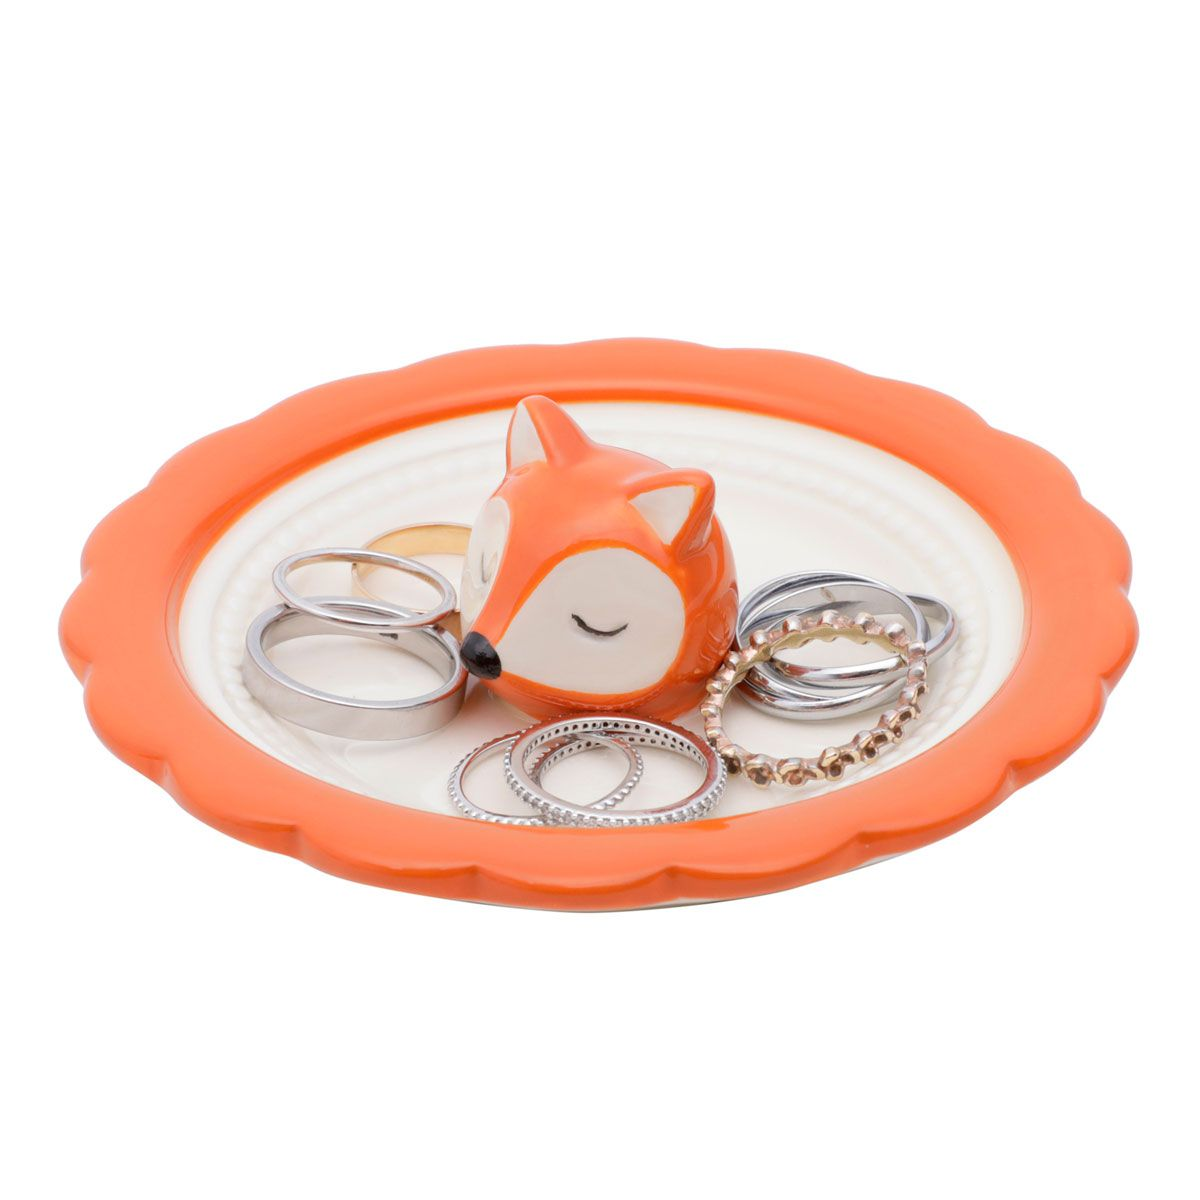 Mini Prato Decorativo Porta Anéis e Acessórios Raposa Face Laranja